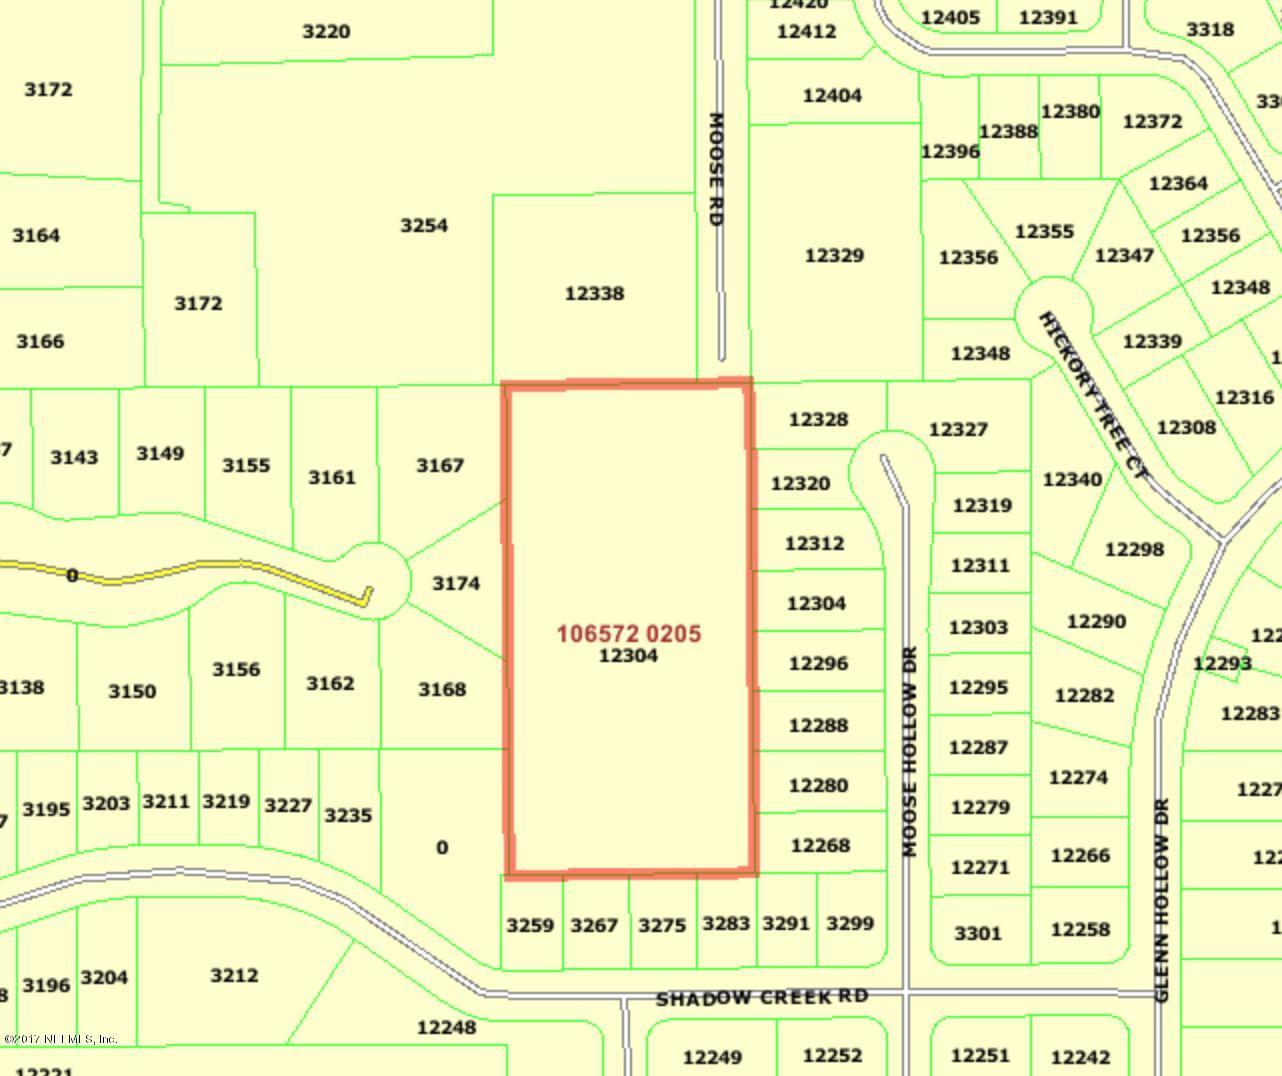 12304 MOOSE RD, JACKSONVILLE, FL 32226